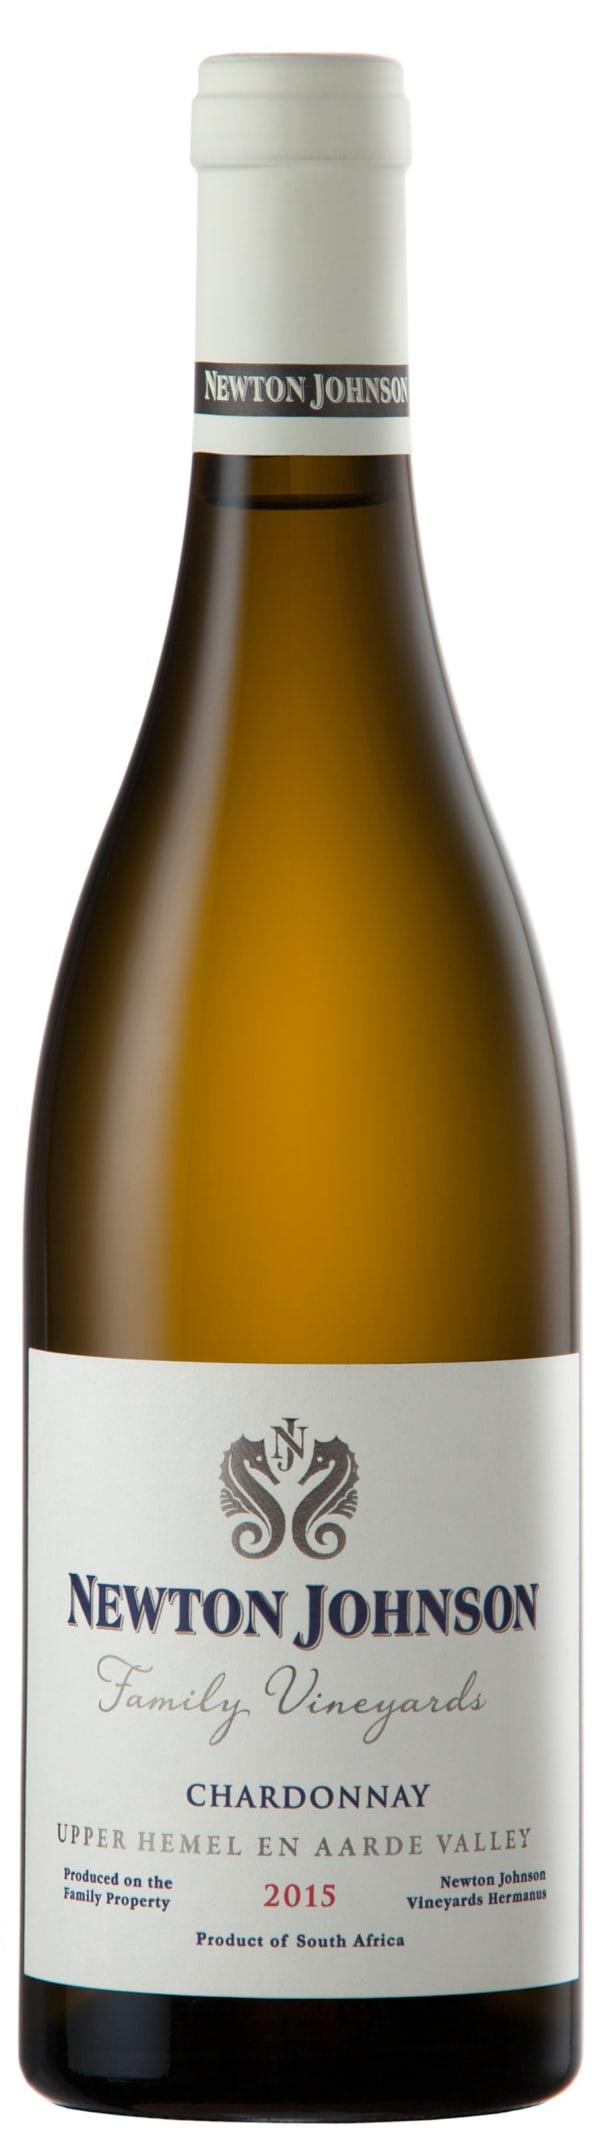 Newton Johnson Chardonnay 2015